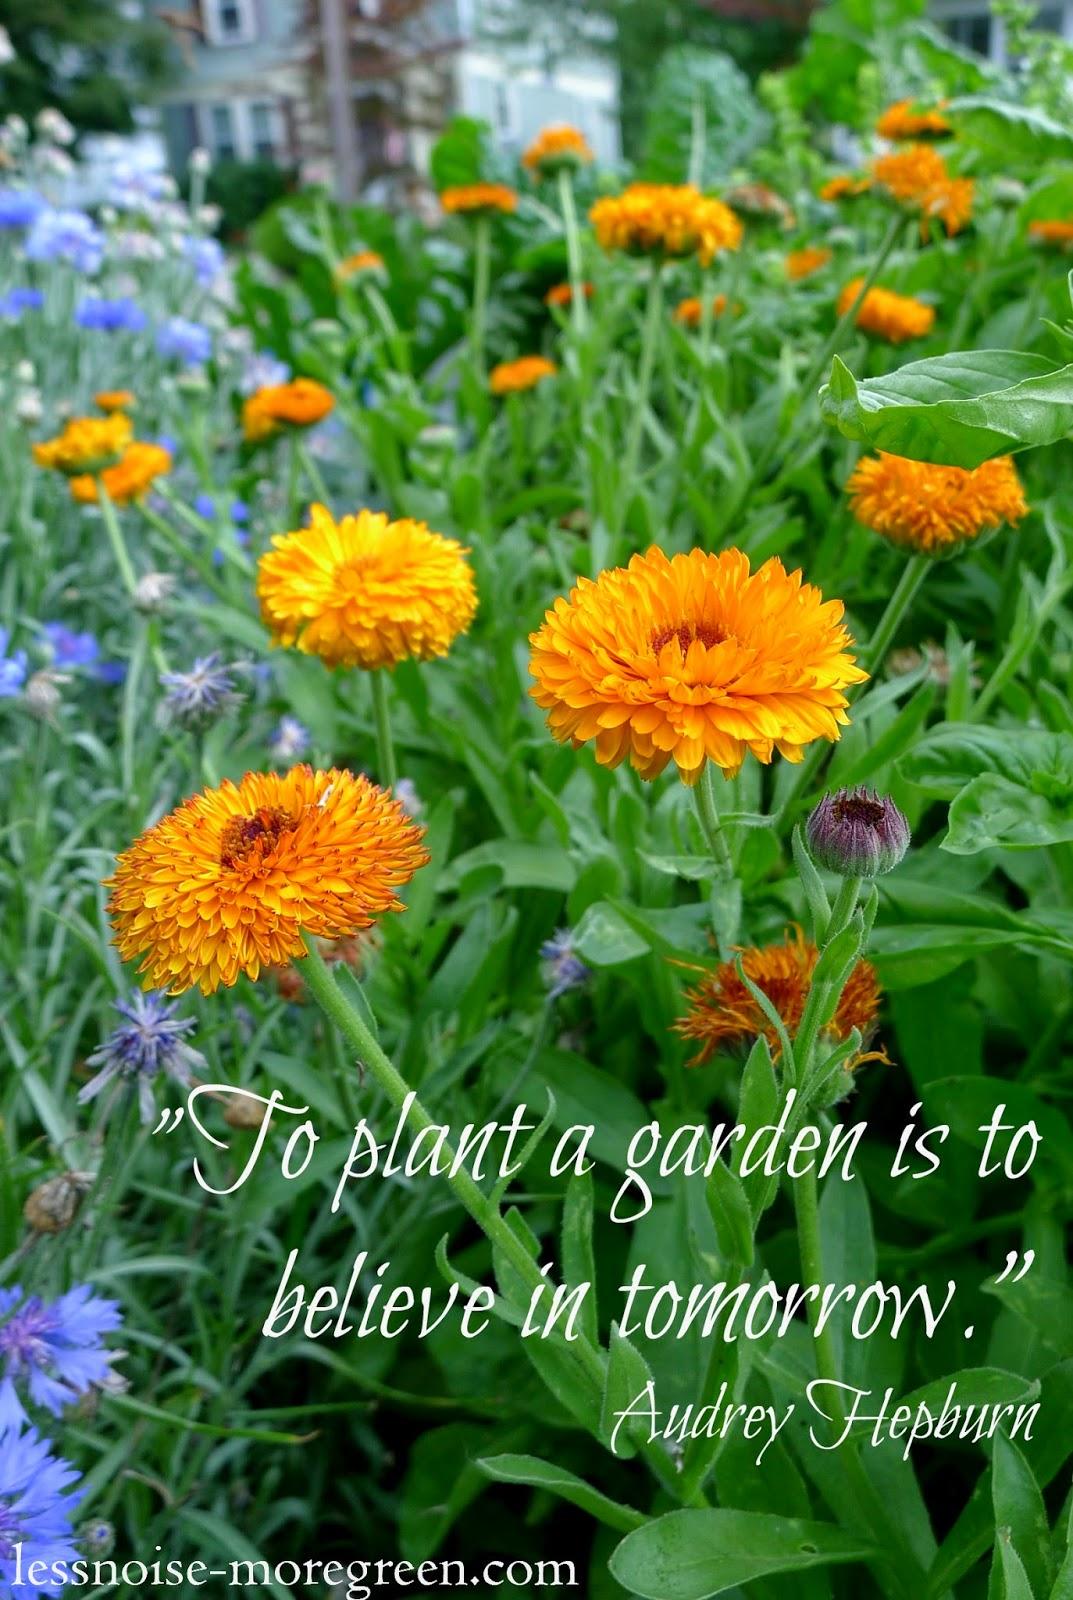 To plant a garden is to believe in tomorrow, Audrey Hepburn quote, gardening quote